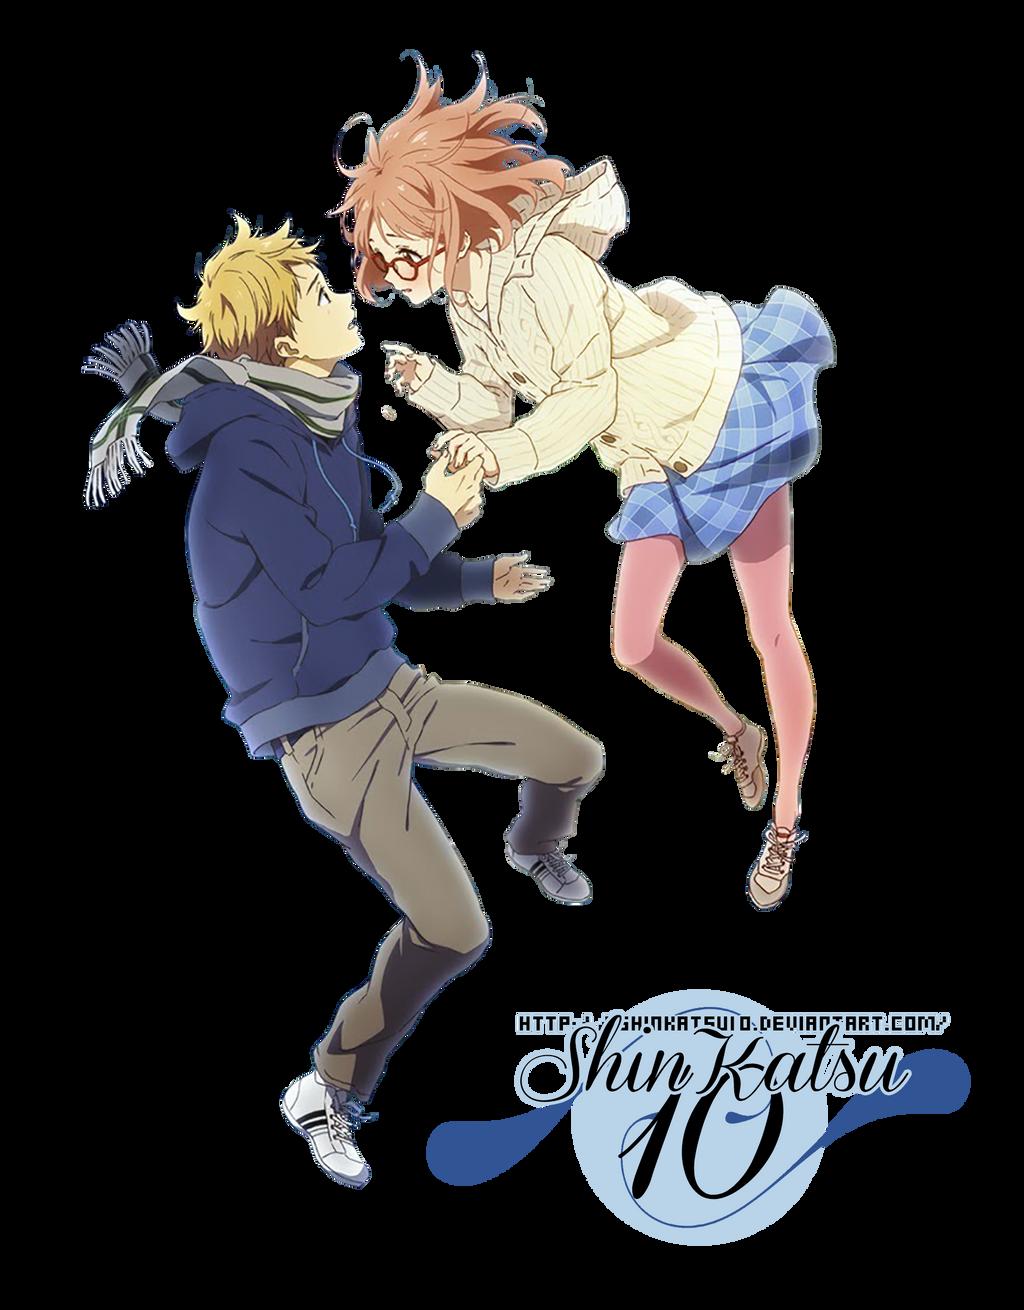 Renders anime _render_11__kyoukai_no_kanata_by_shinkatsu10-d8ib05a